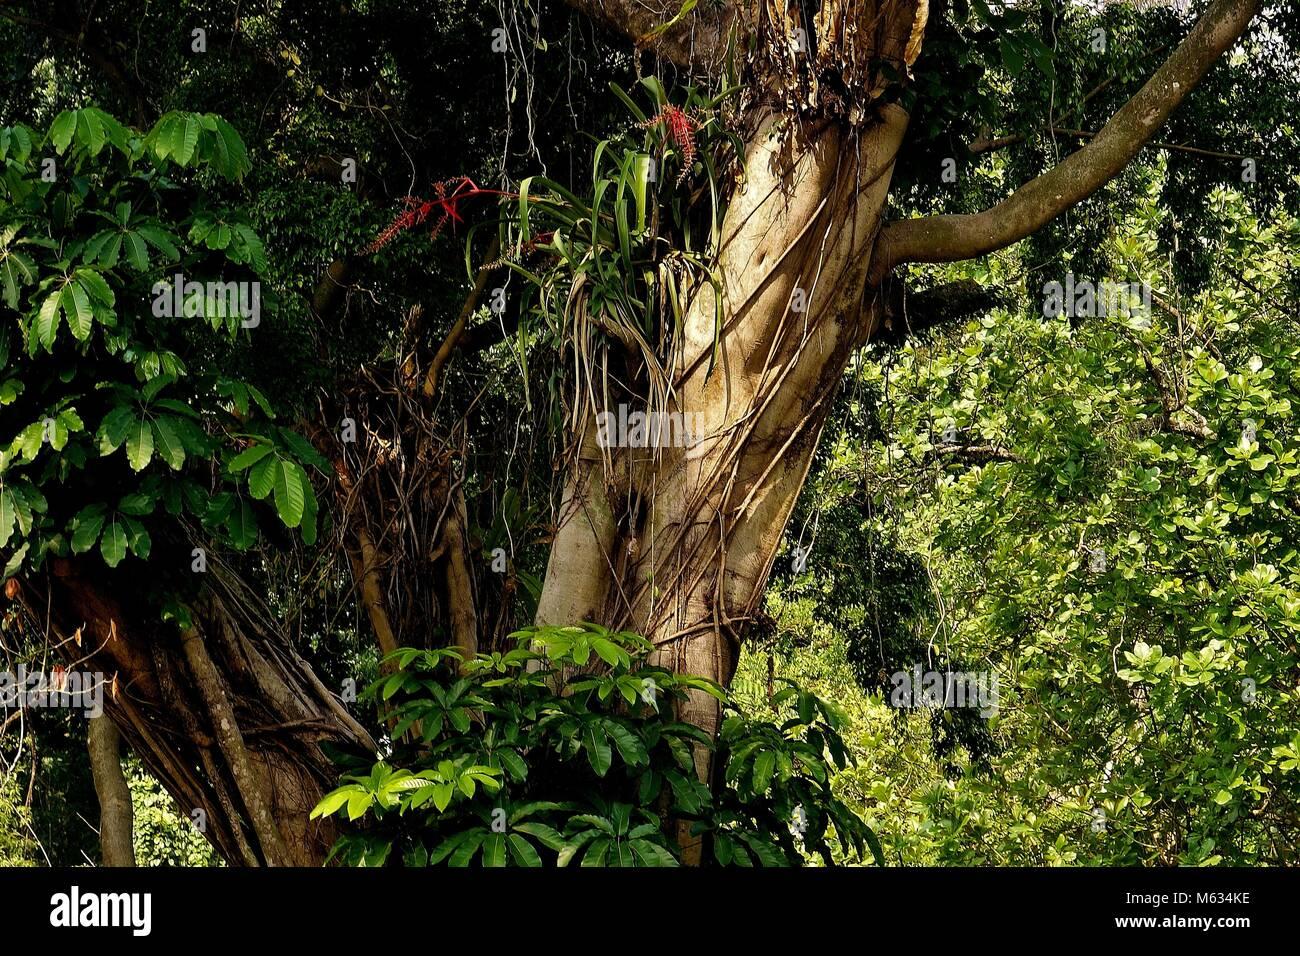 botanischen stock photos botanischen stock images alamy. Black Bedroom Furniture Sets. Home Design Ideas